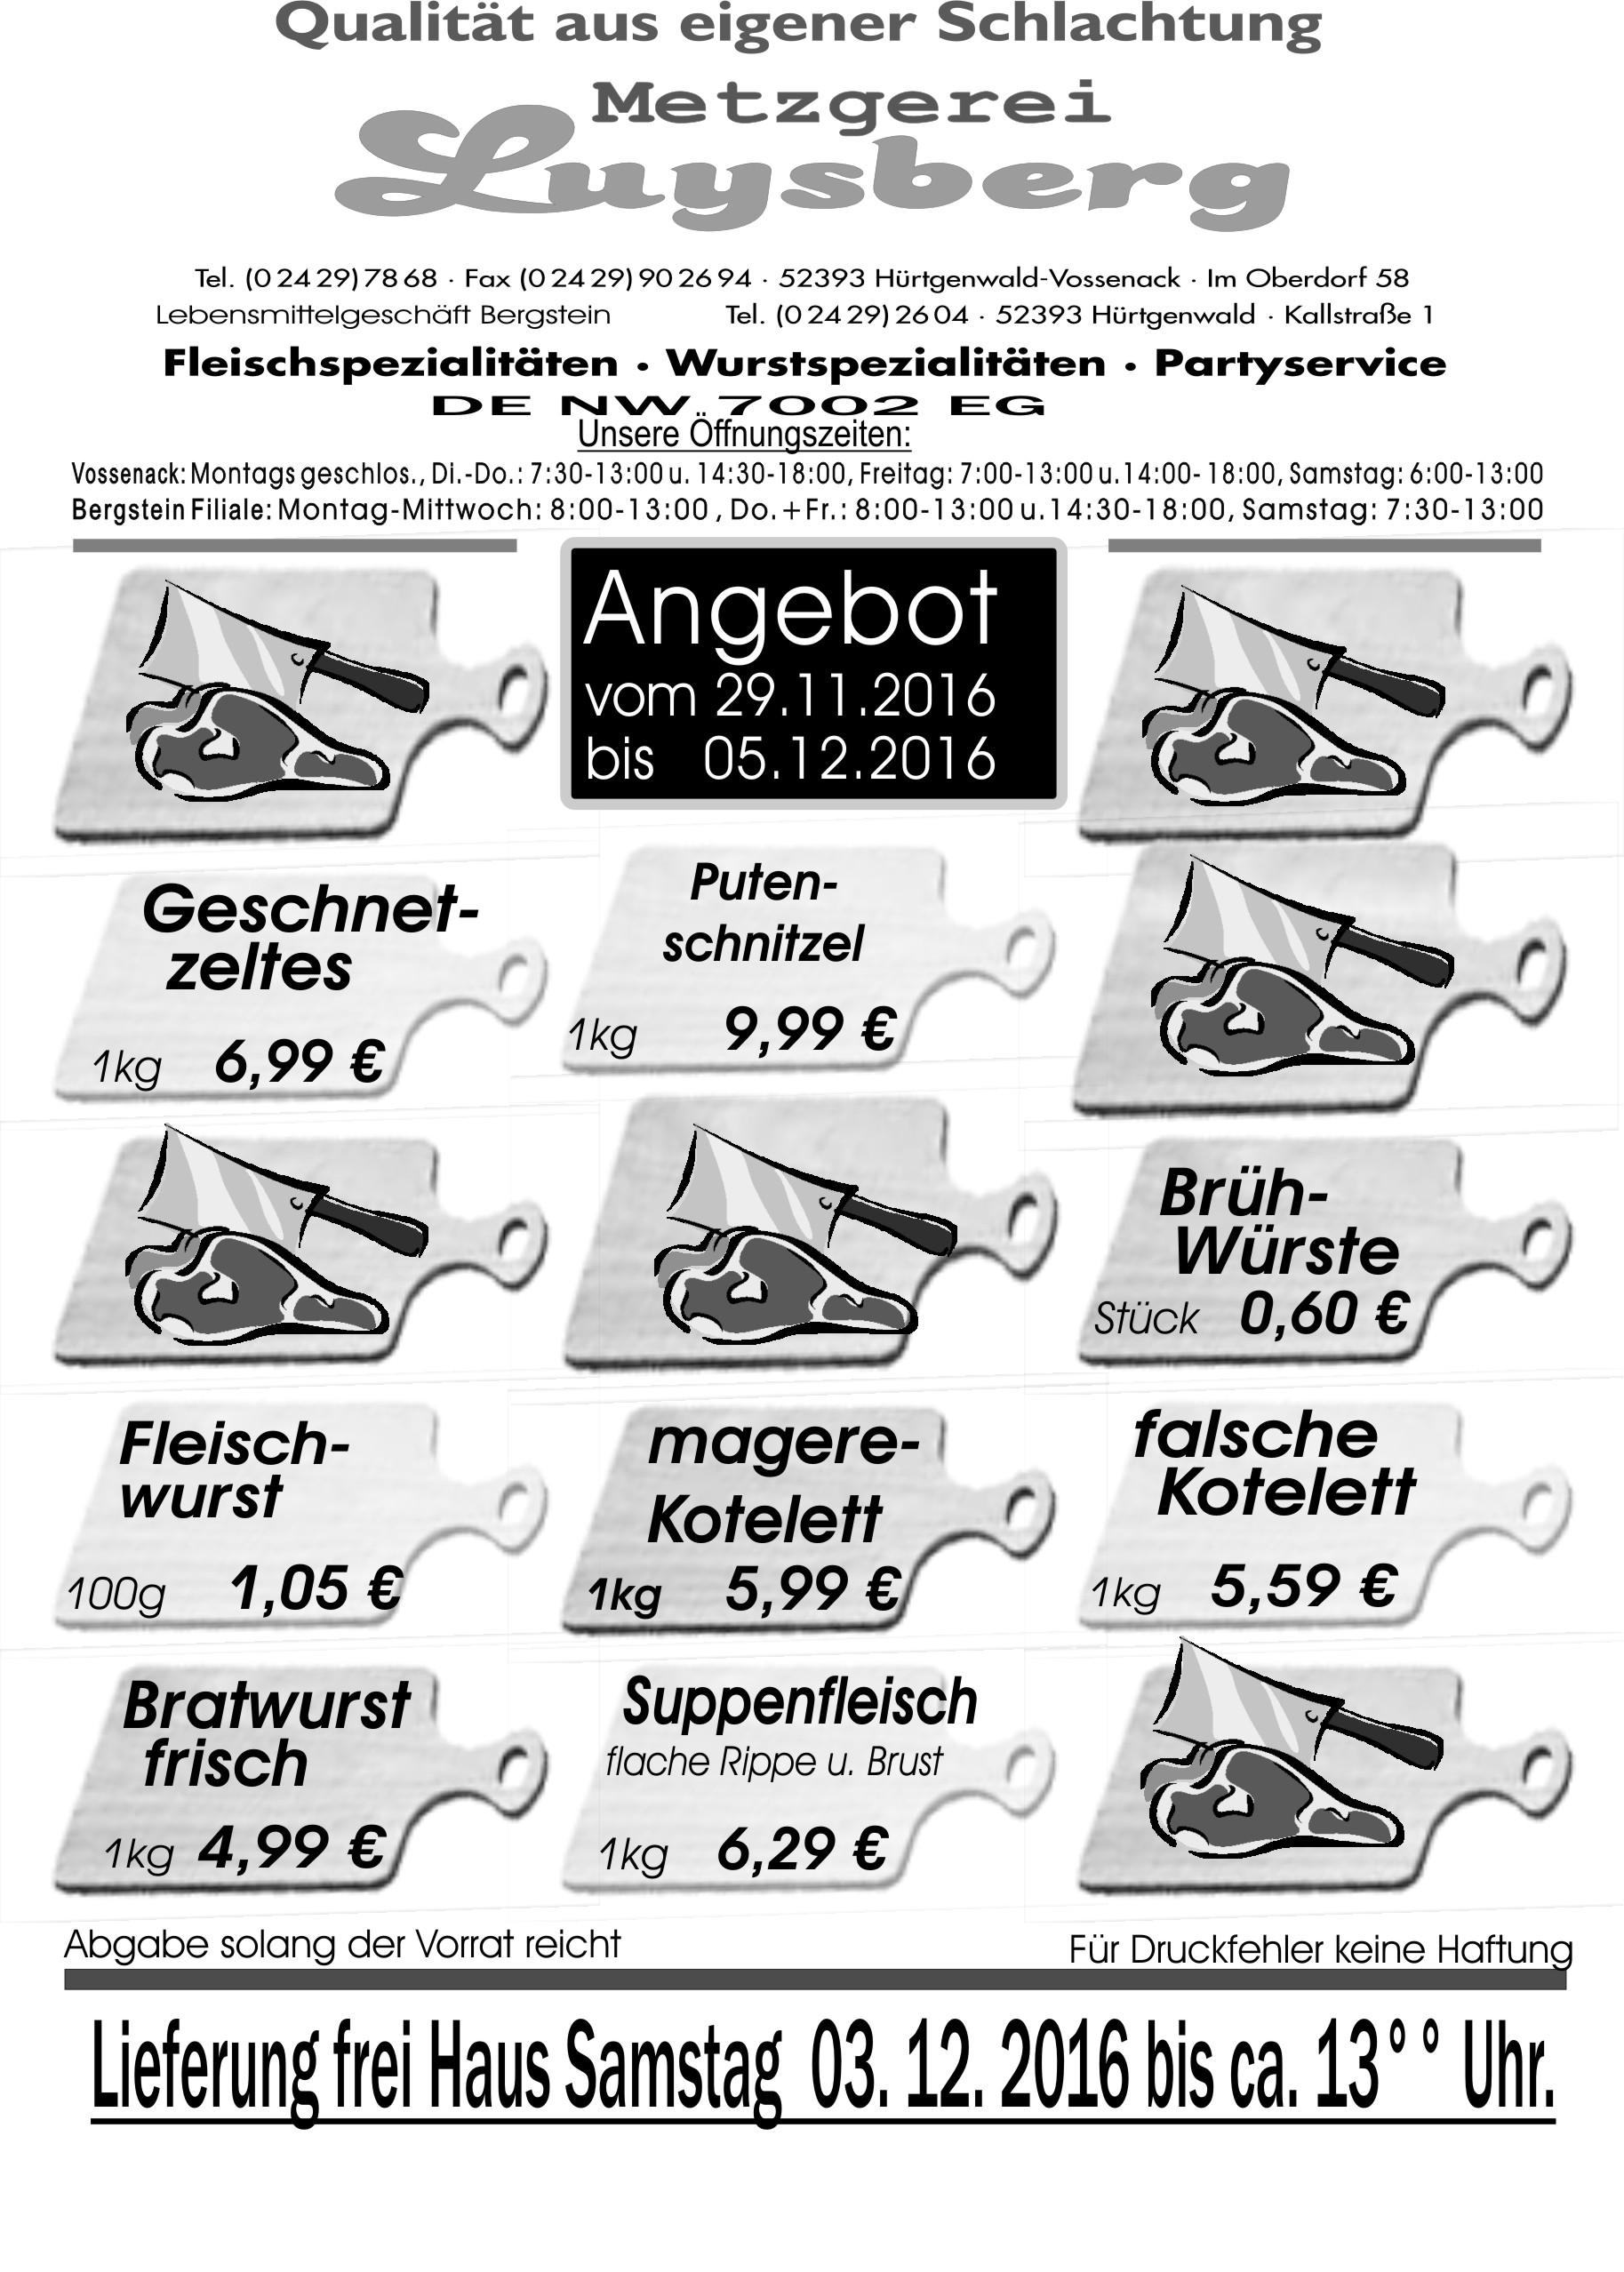 Angebot vom 29.11.-05.12.2016 - Metzgerei Luysberg